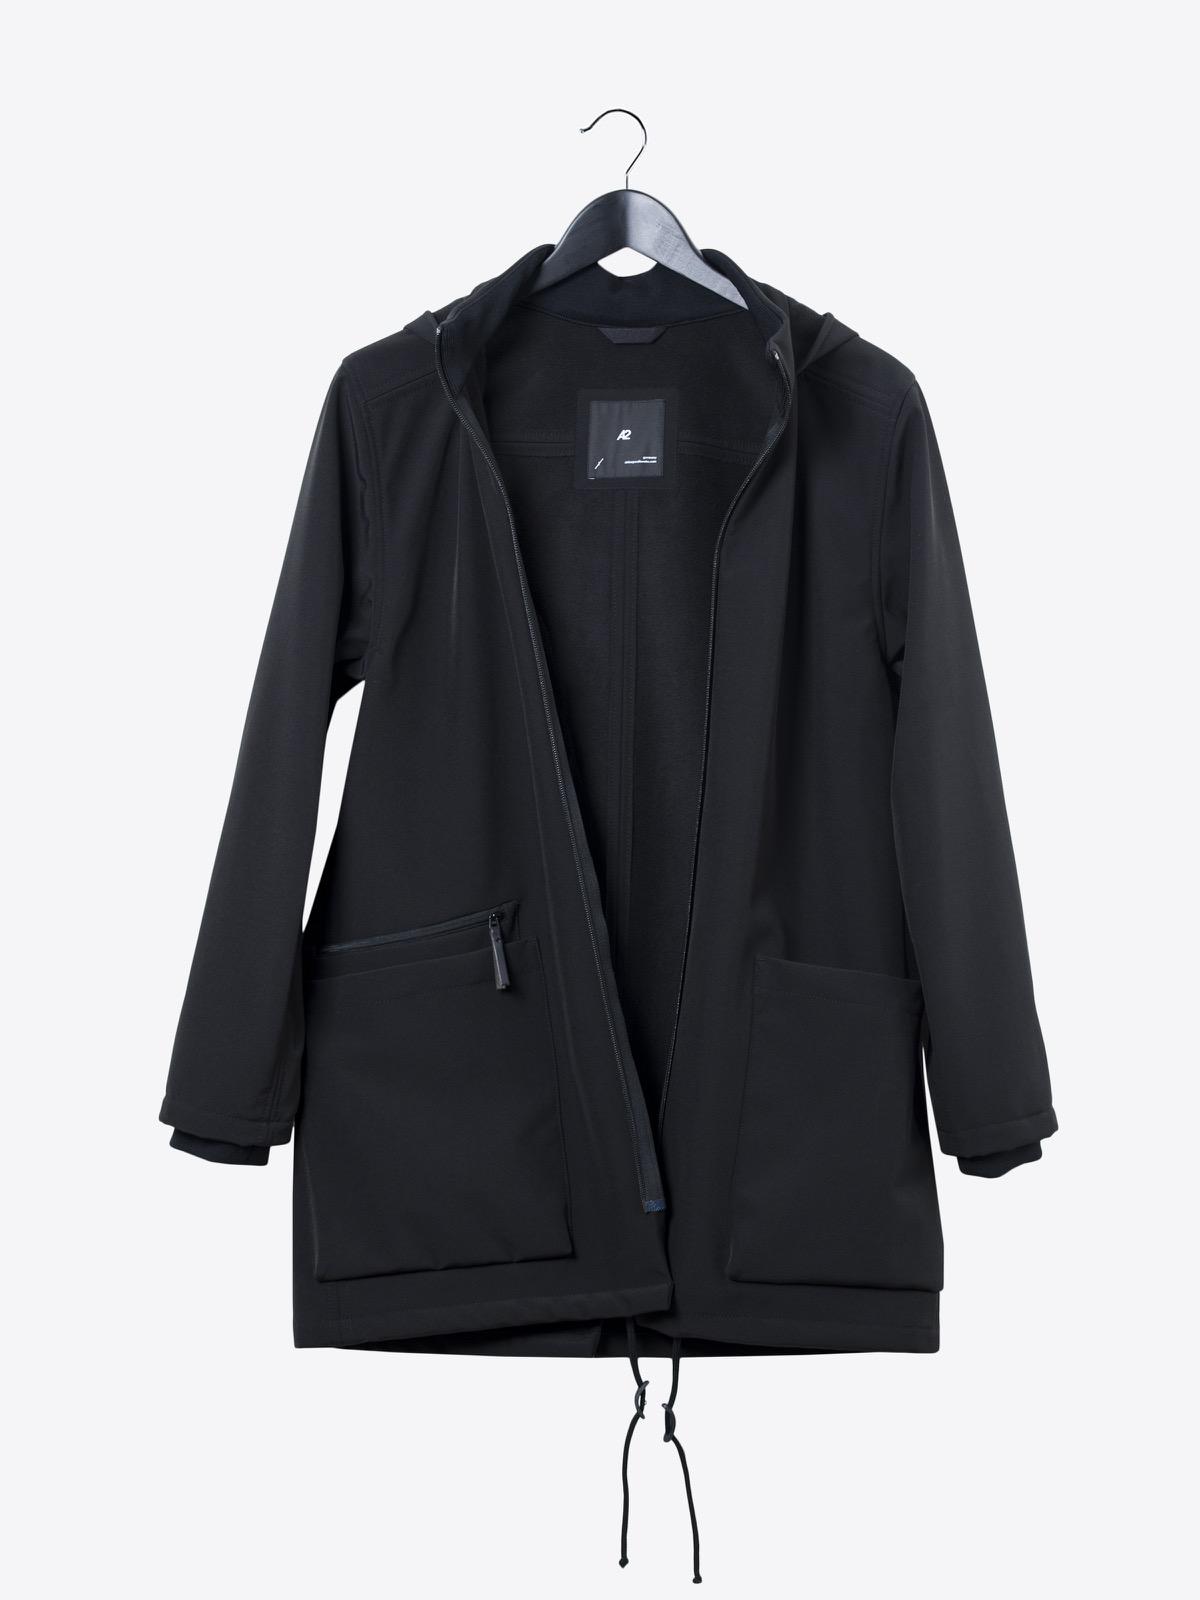 A2 edinburgh polar | black